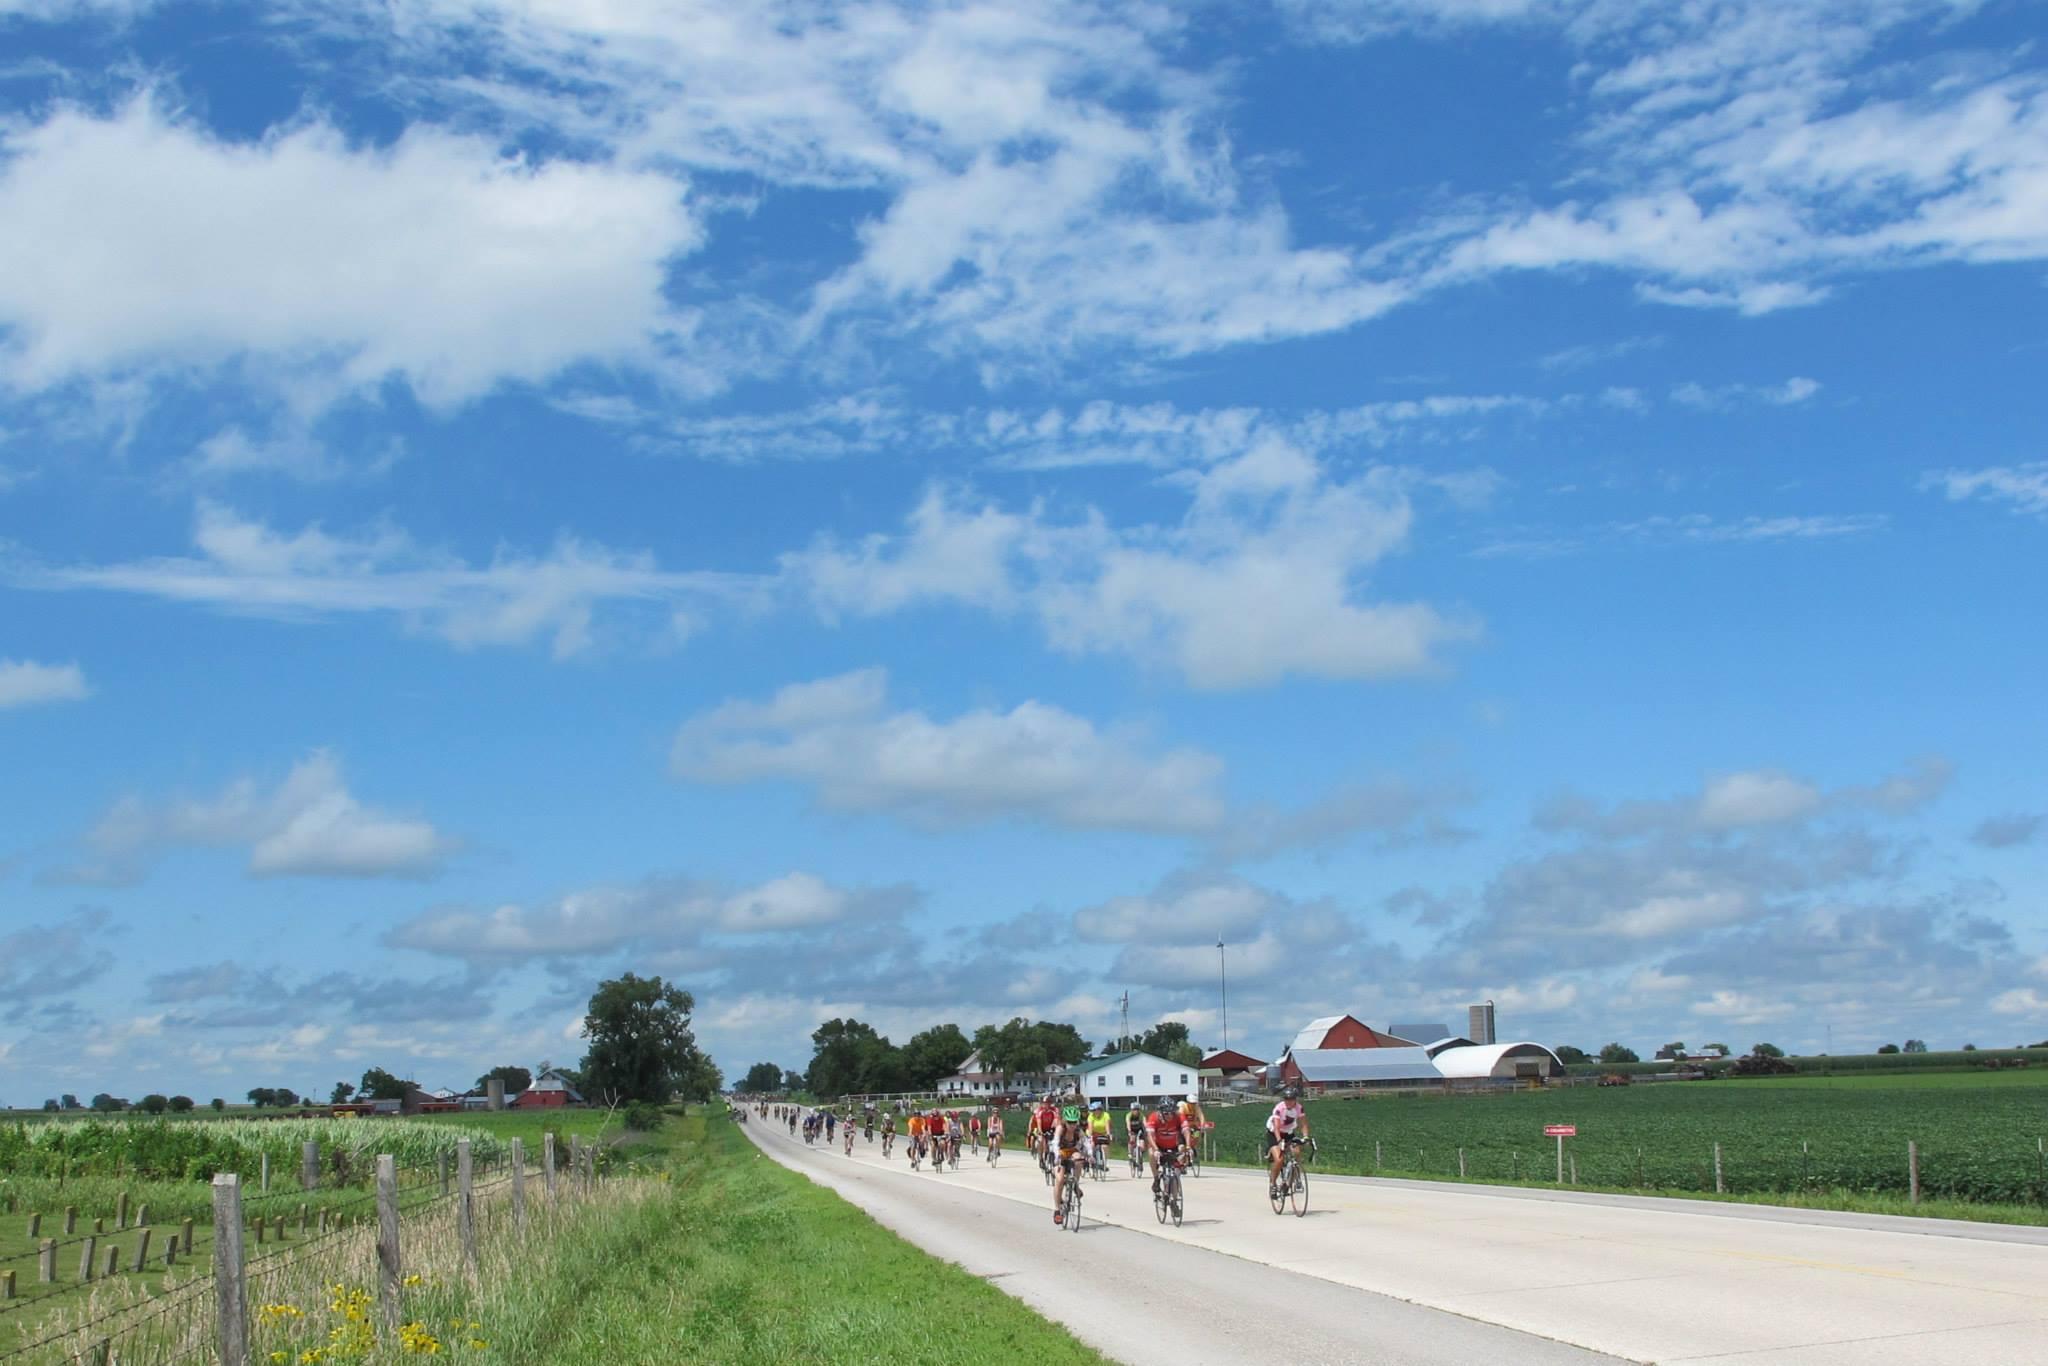 Fantastic days on the road under Iowa skies.